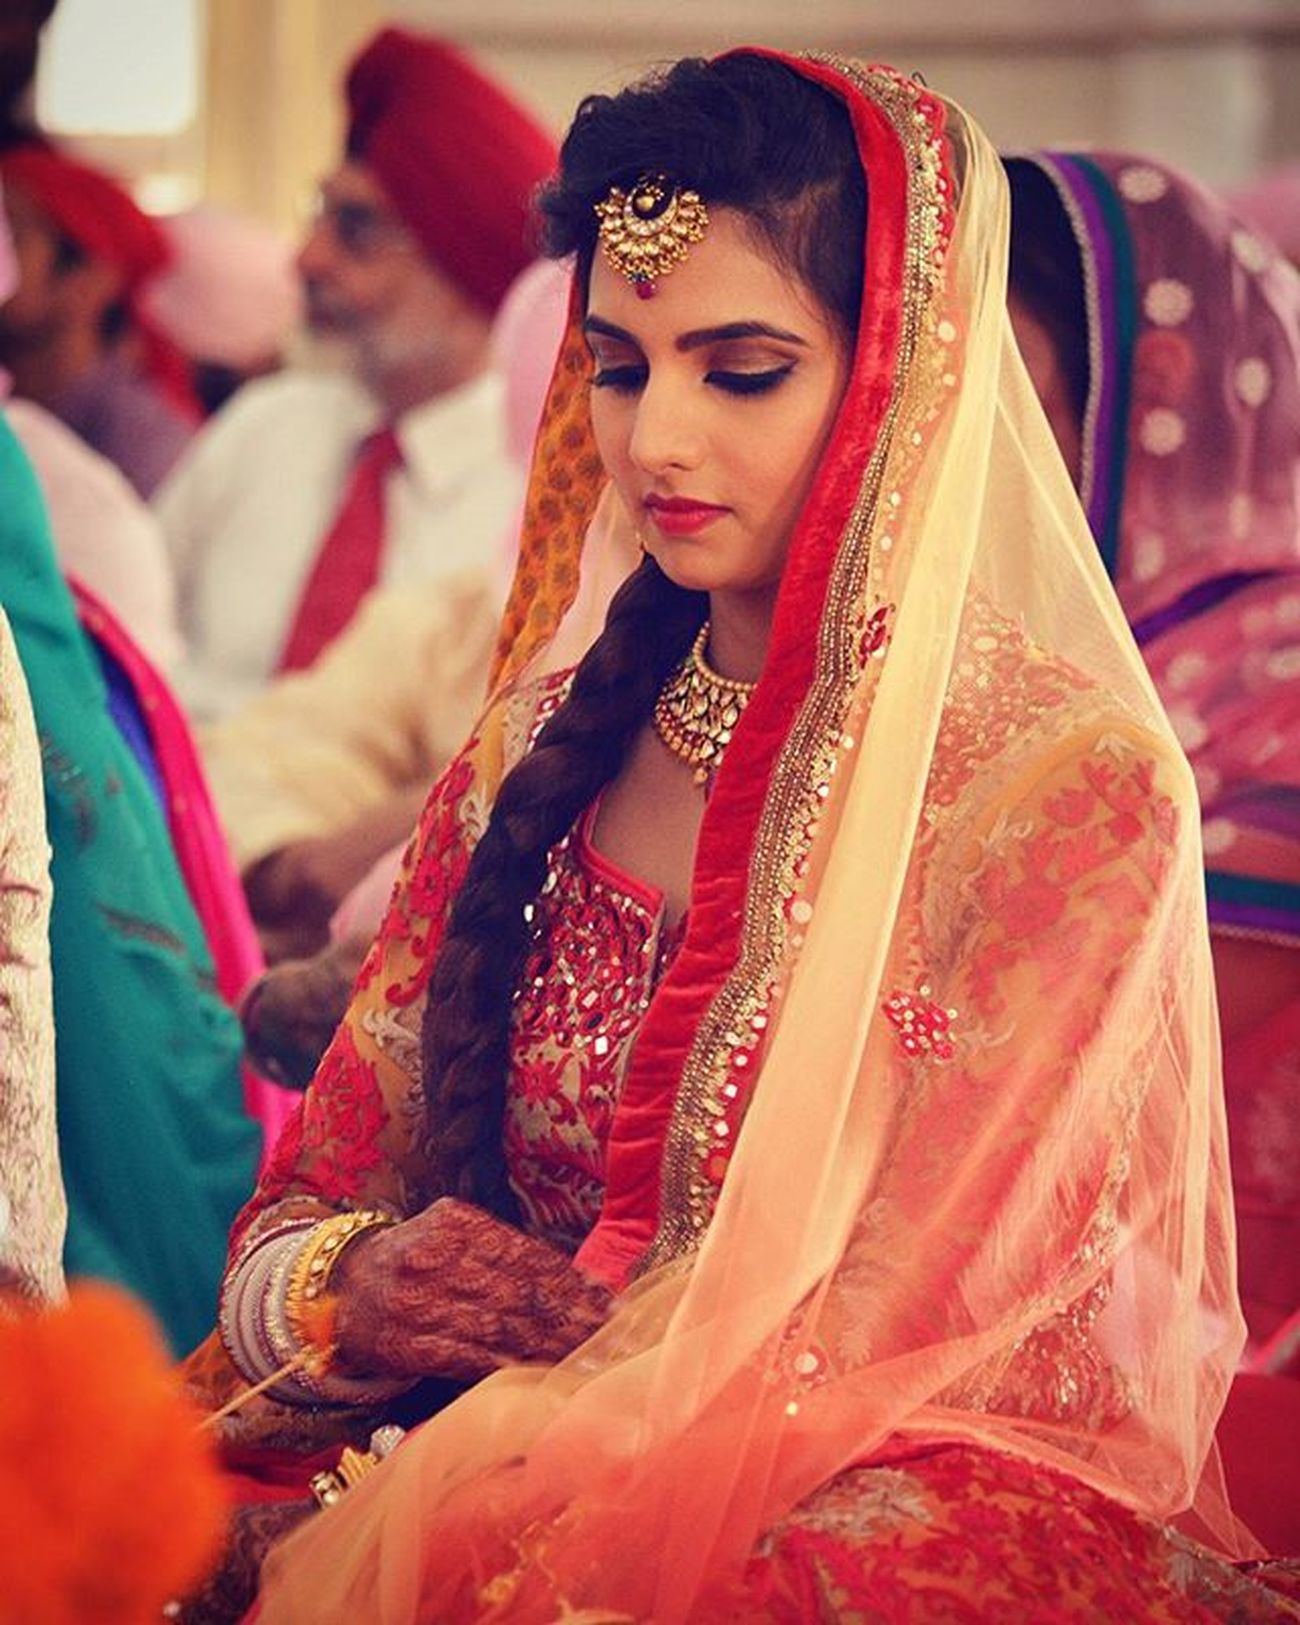 Punjabi Gujarati Aeshkydiwedding Gagans_photography Picsagram Picoftheday Beautiful Bride Stayblessed Bhabhiji